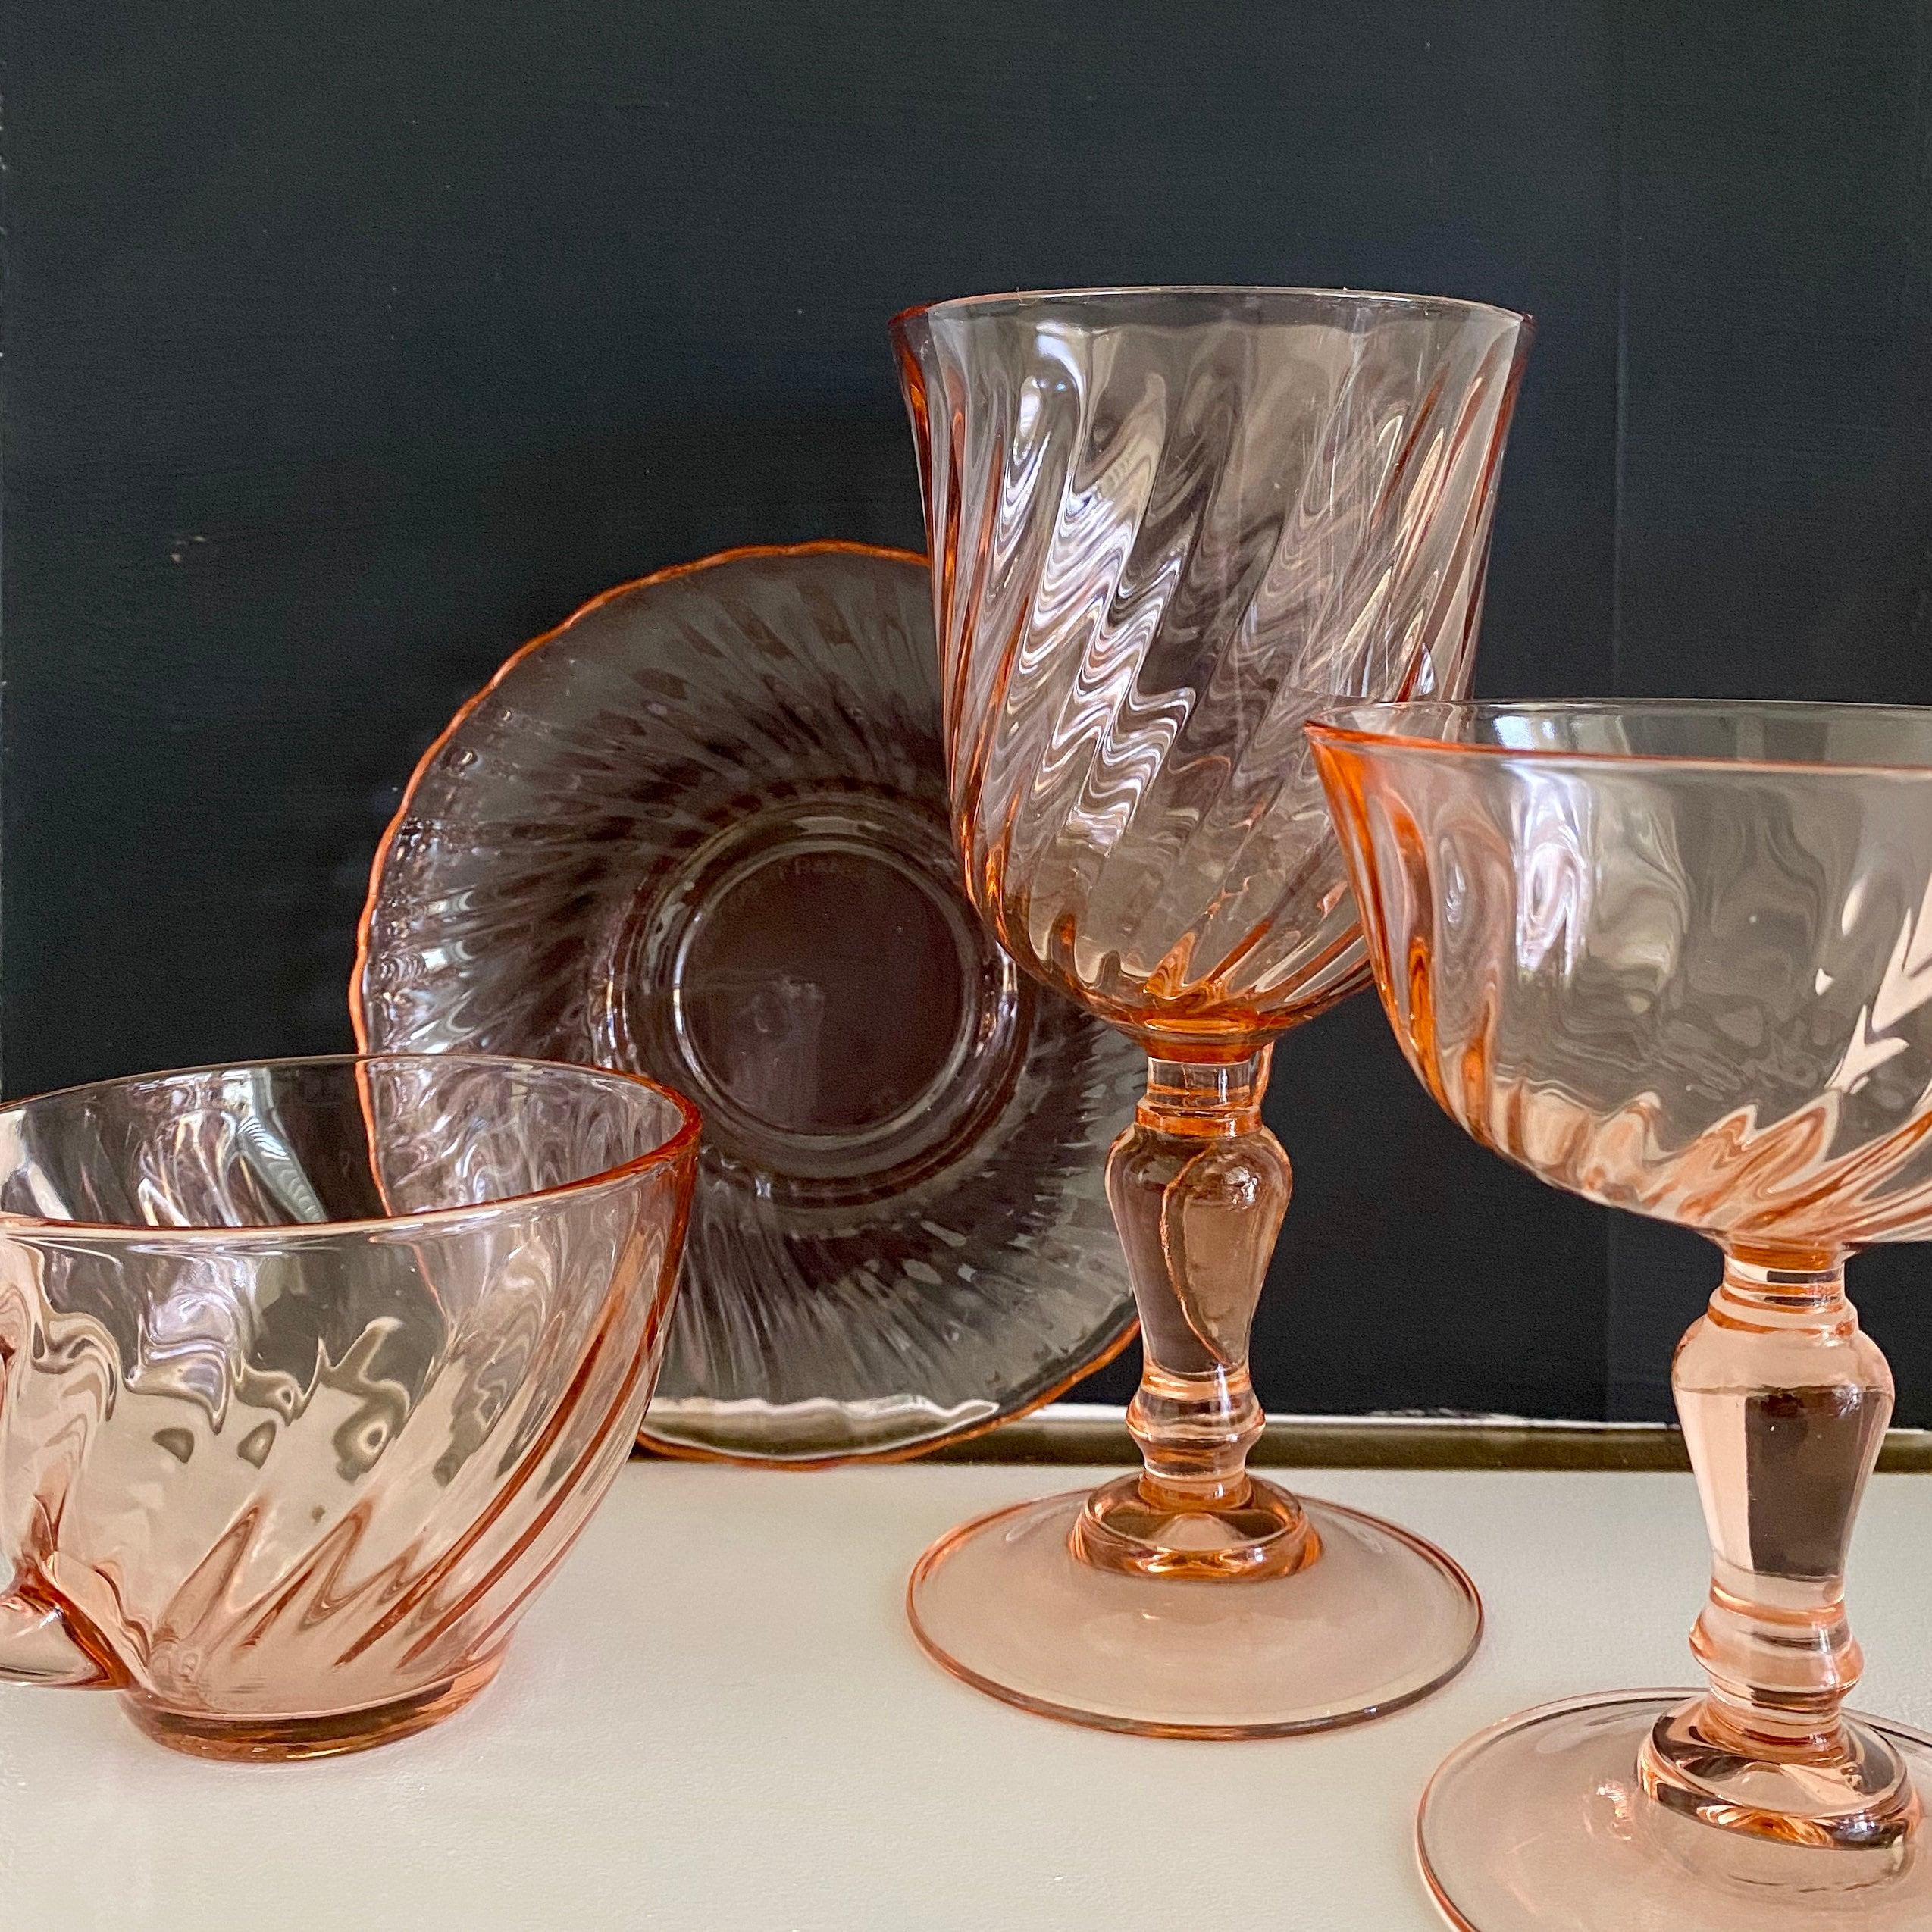 112301: ARCOROC PINK SWIRL GLASS STEMWARE & DISHES, 82 - Nov 15, 2009 |  DuMouchelles in MI